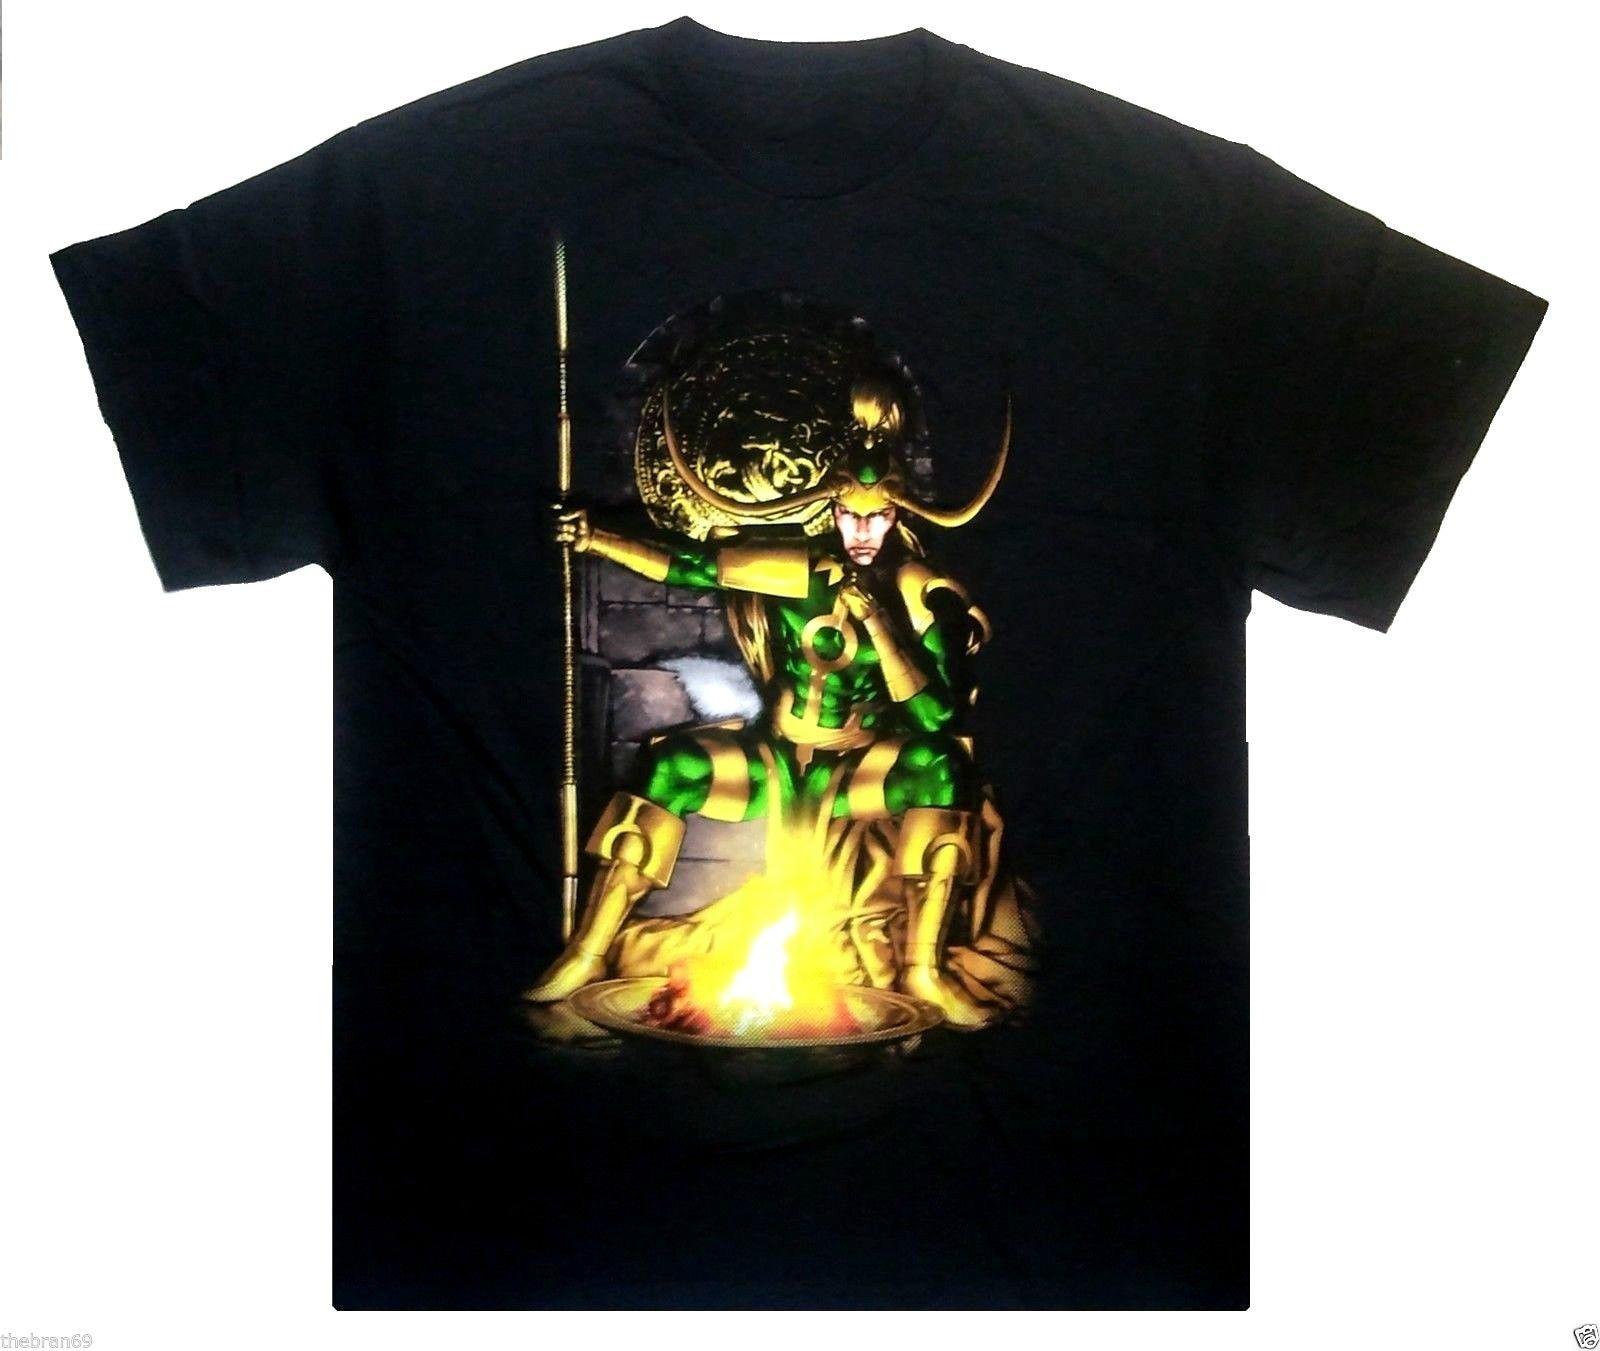 Marvel: 'Loki Throne' 100% Cotton Comic Book Superhero Character T-Shirt {M-L} Short Sleeve Men T shirt Tops Summer